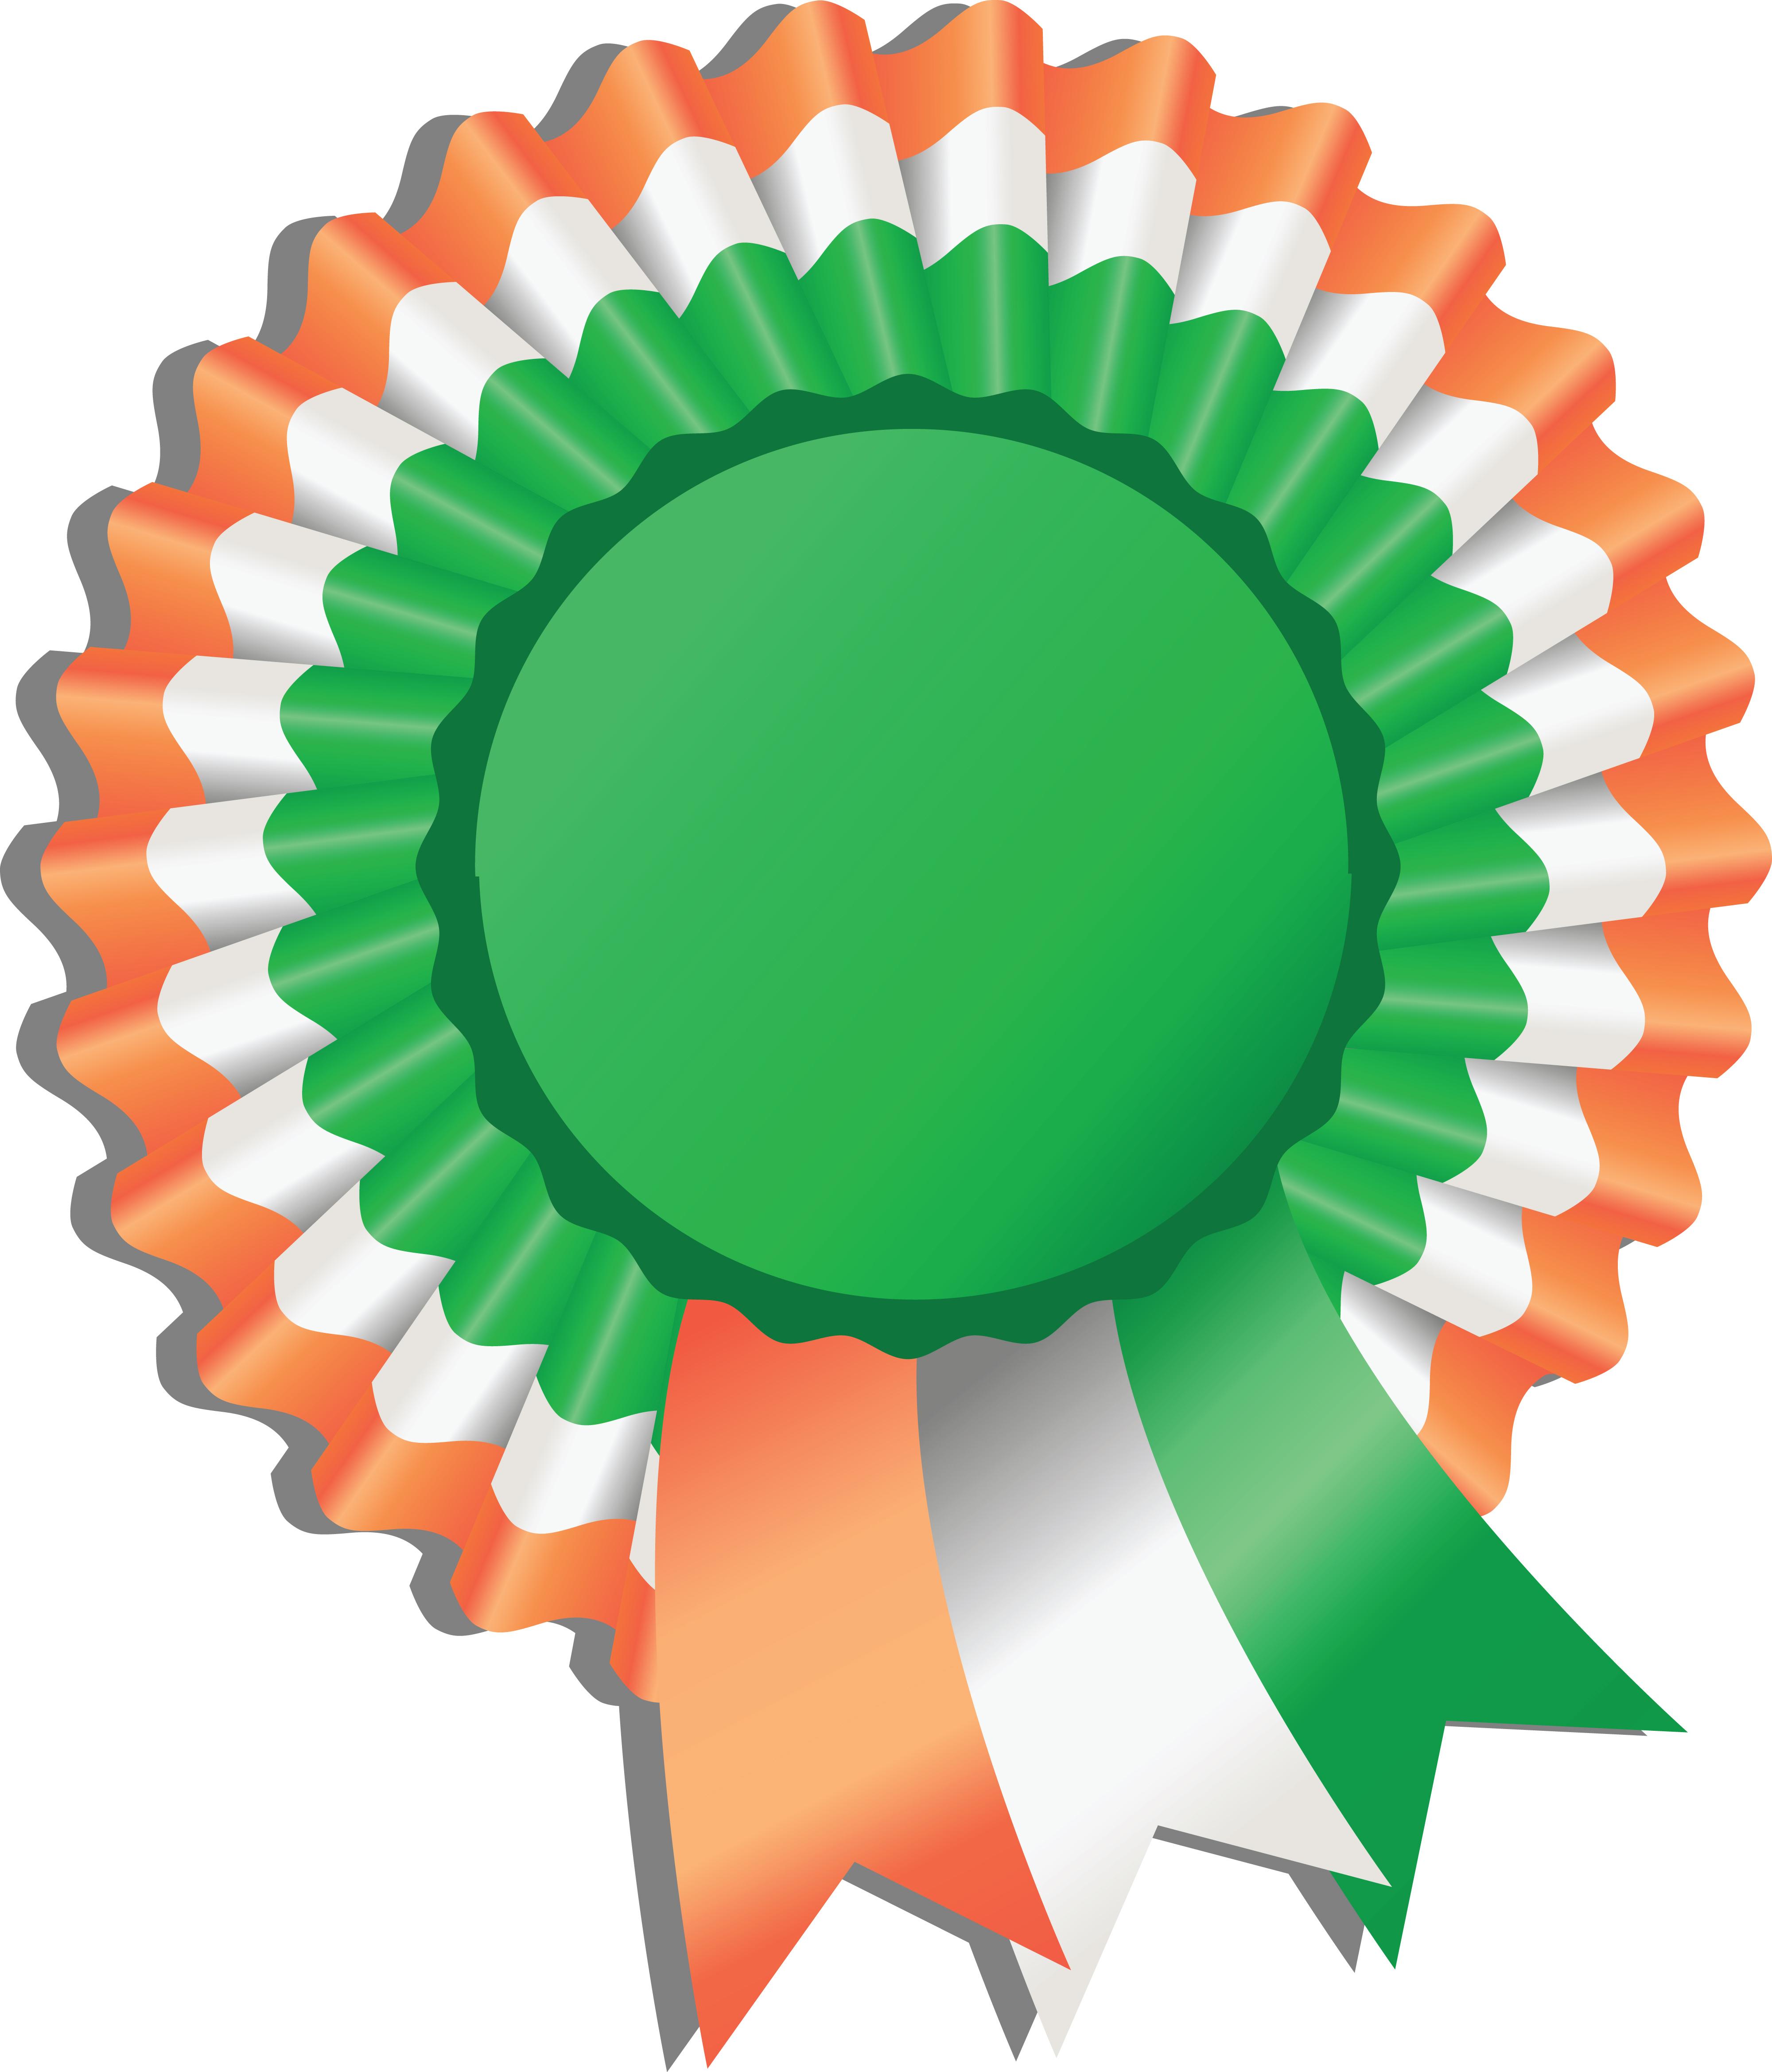 Free Clipart Of A St Paddy's Day Irish Ribbon Award